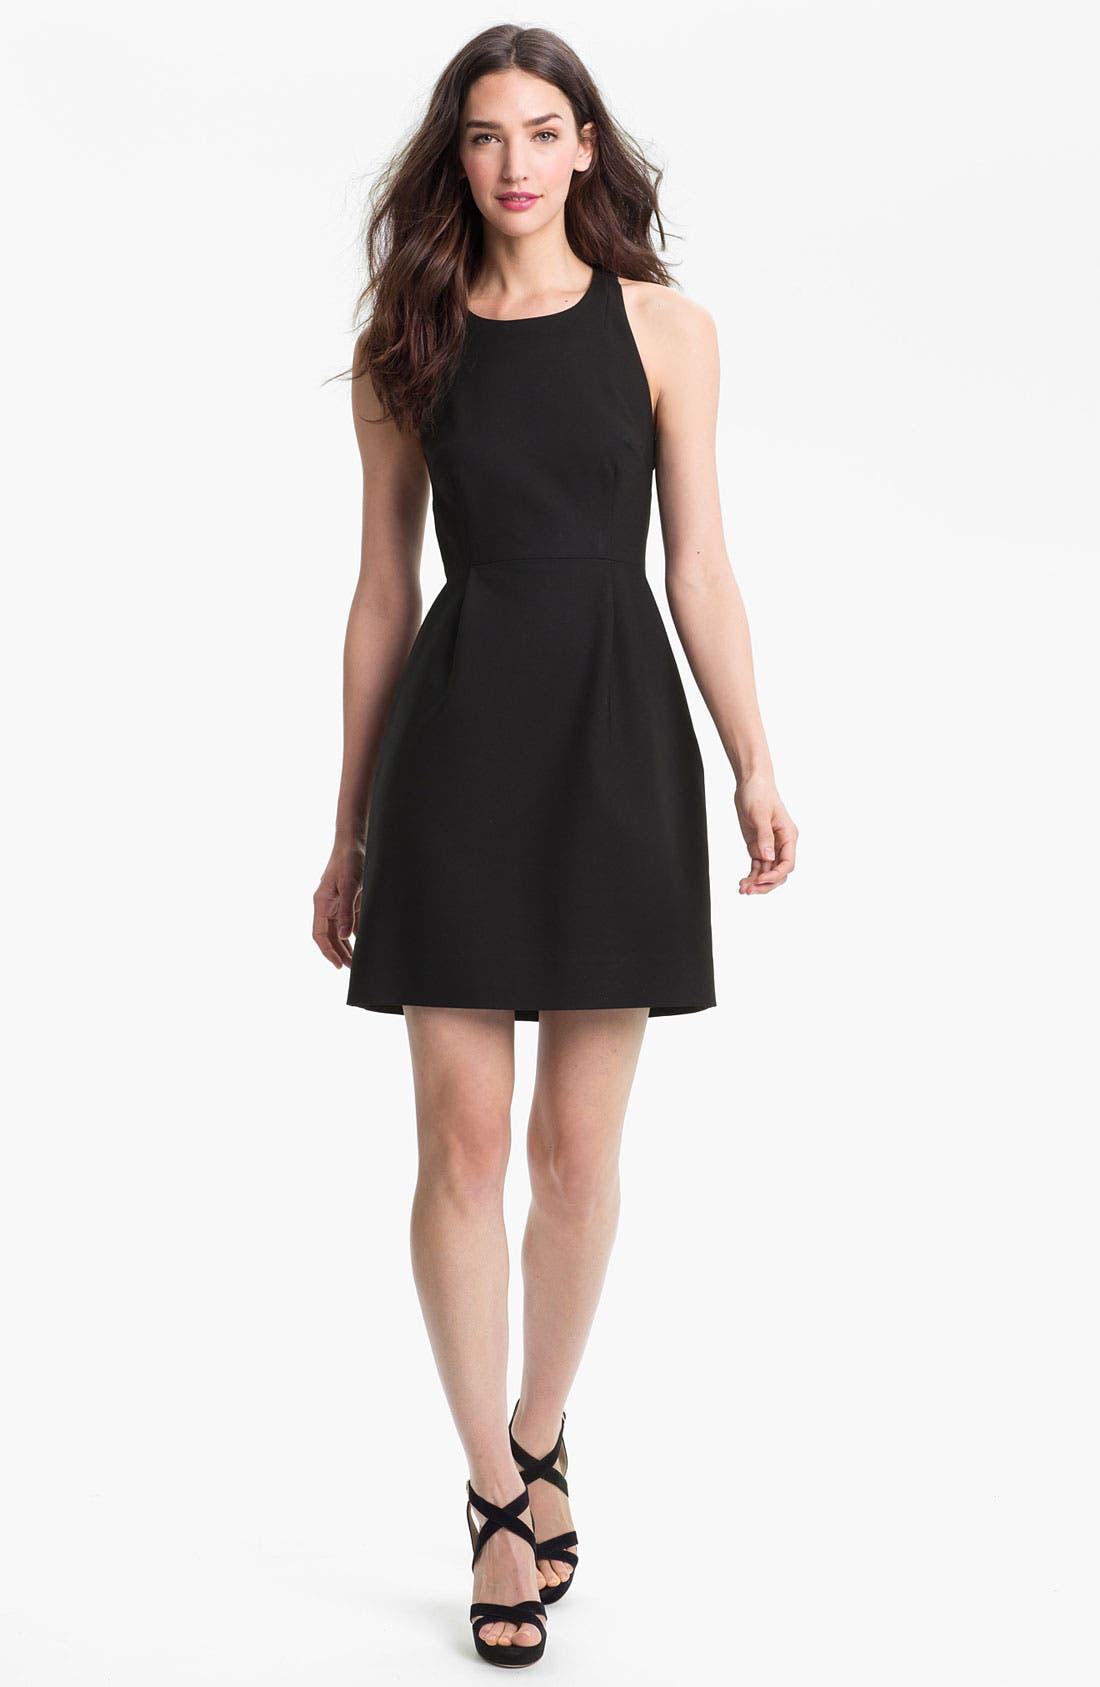 Alternate Image 1 Selected - kate spade new york 'billie' cotton blend fit & flare dress